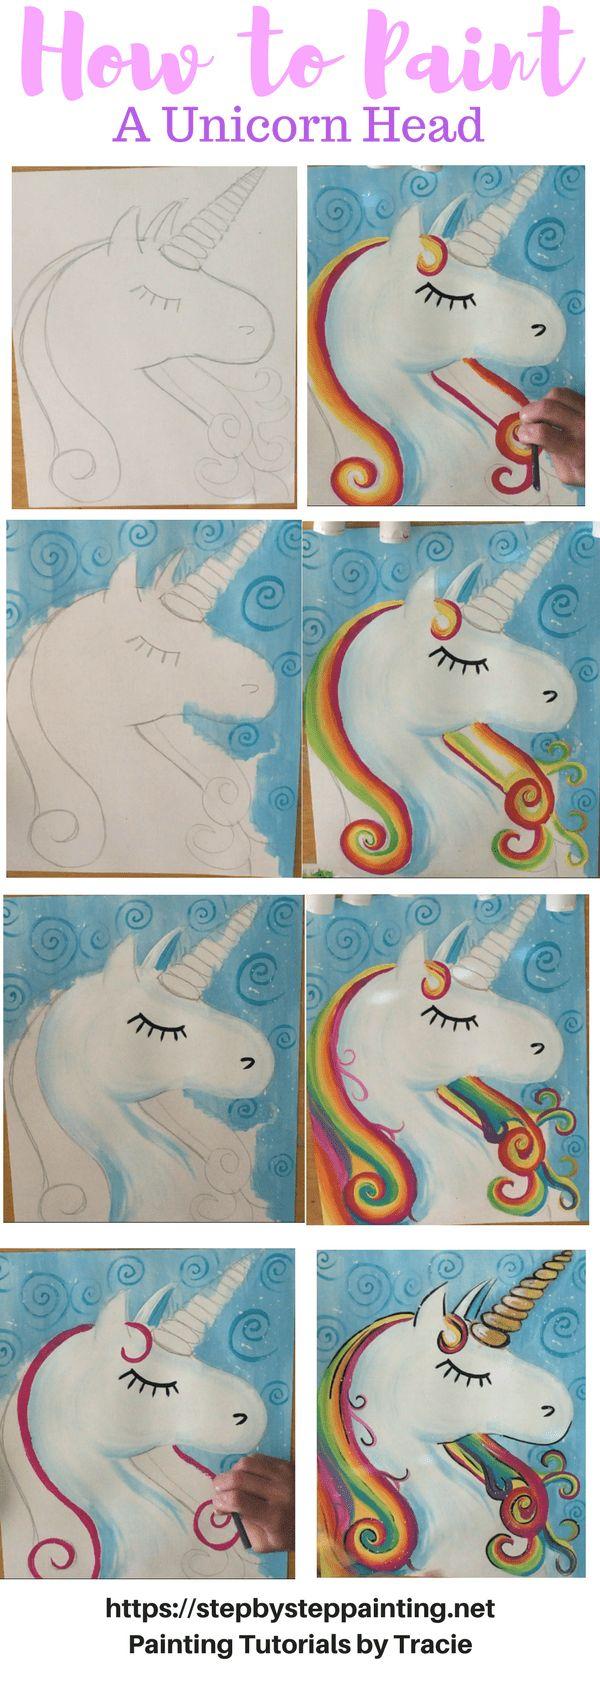 Best 25+ Unicorns ideas on Pinterest | Cute unicorn ...